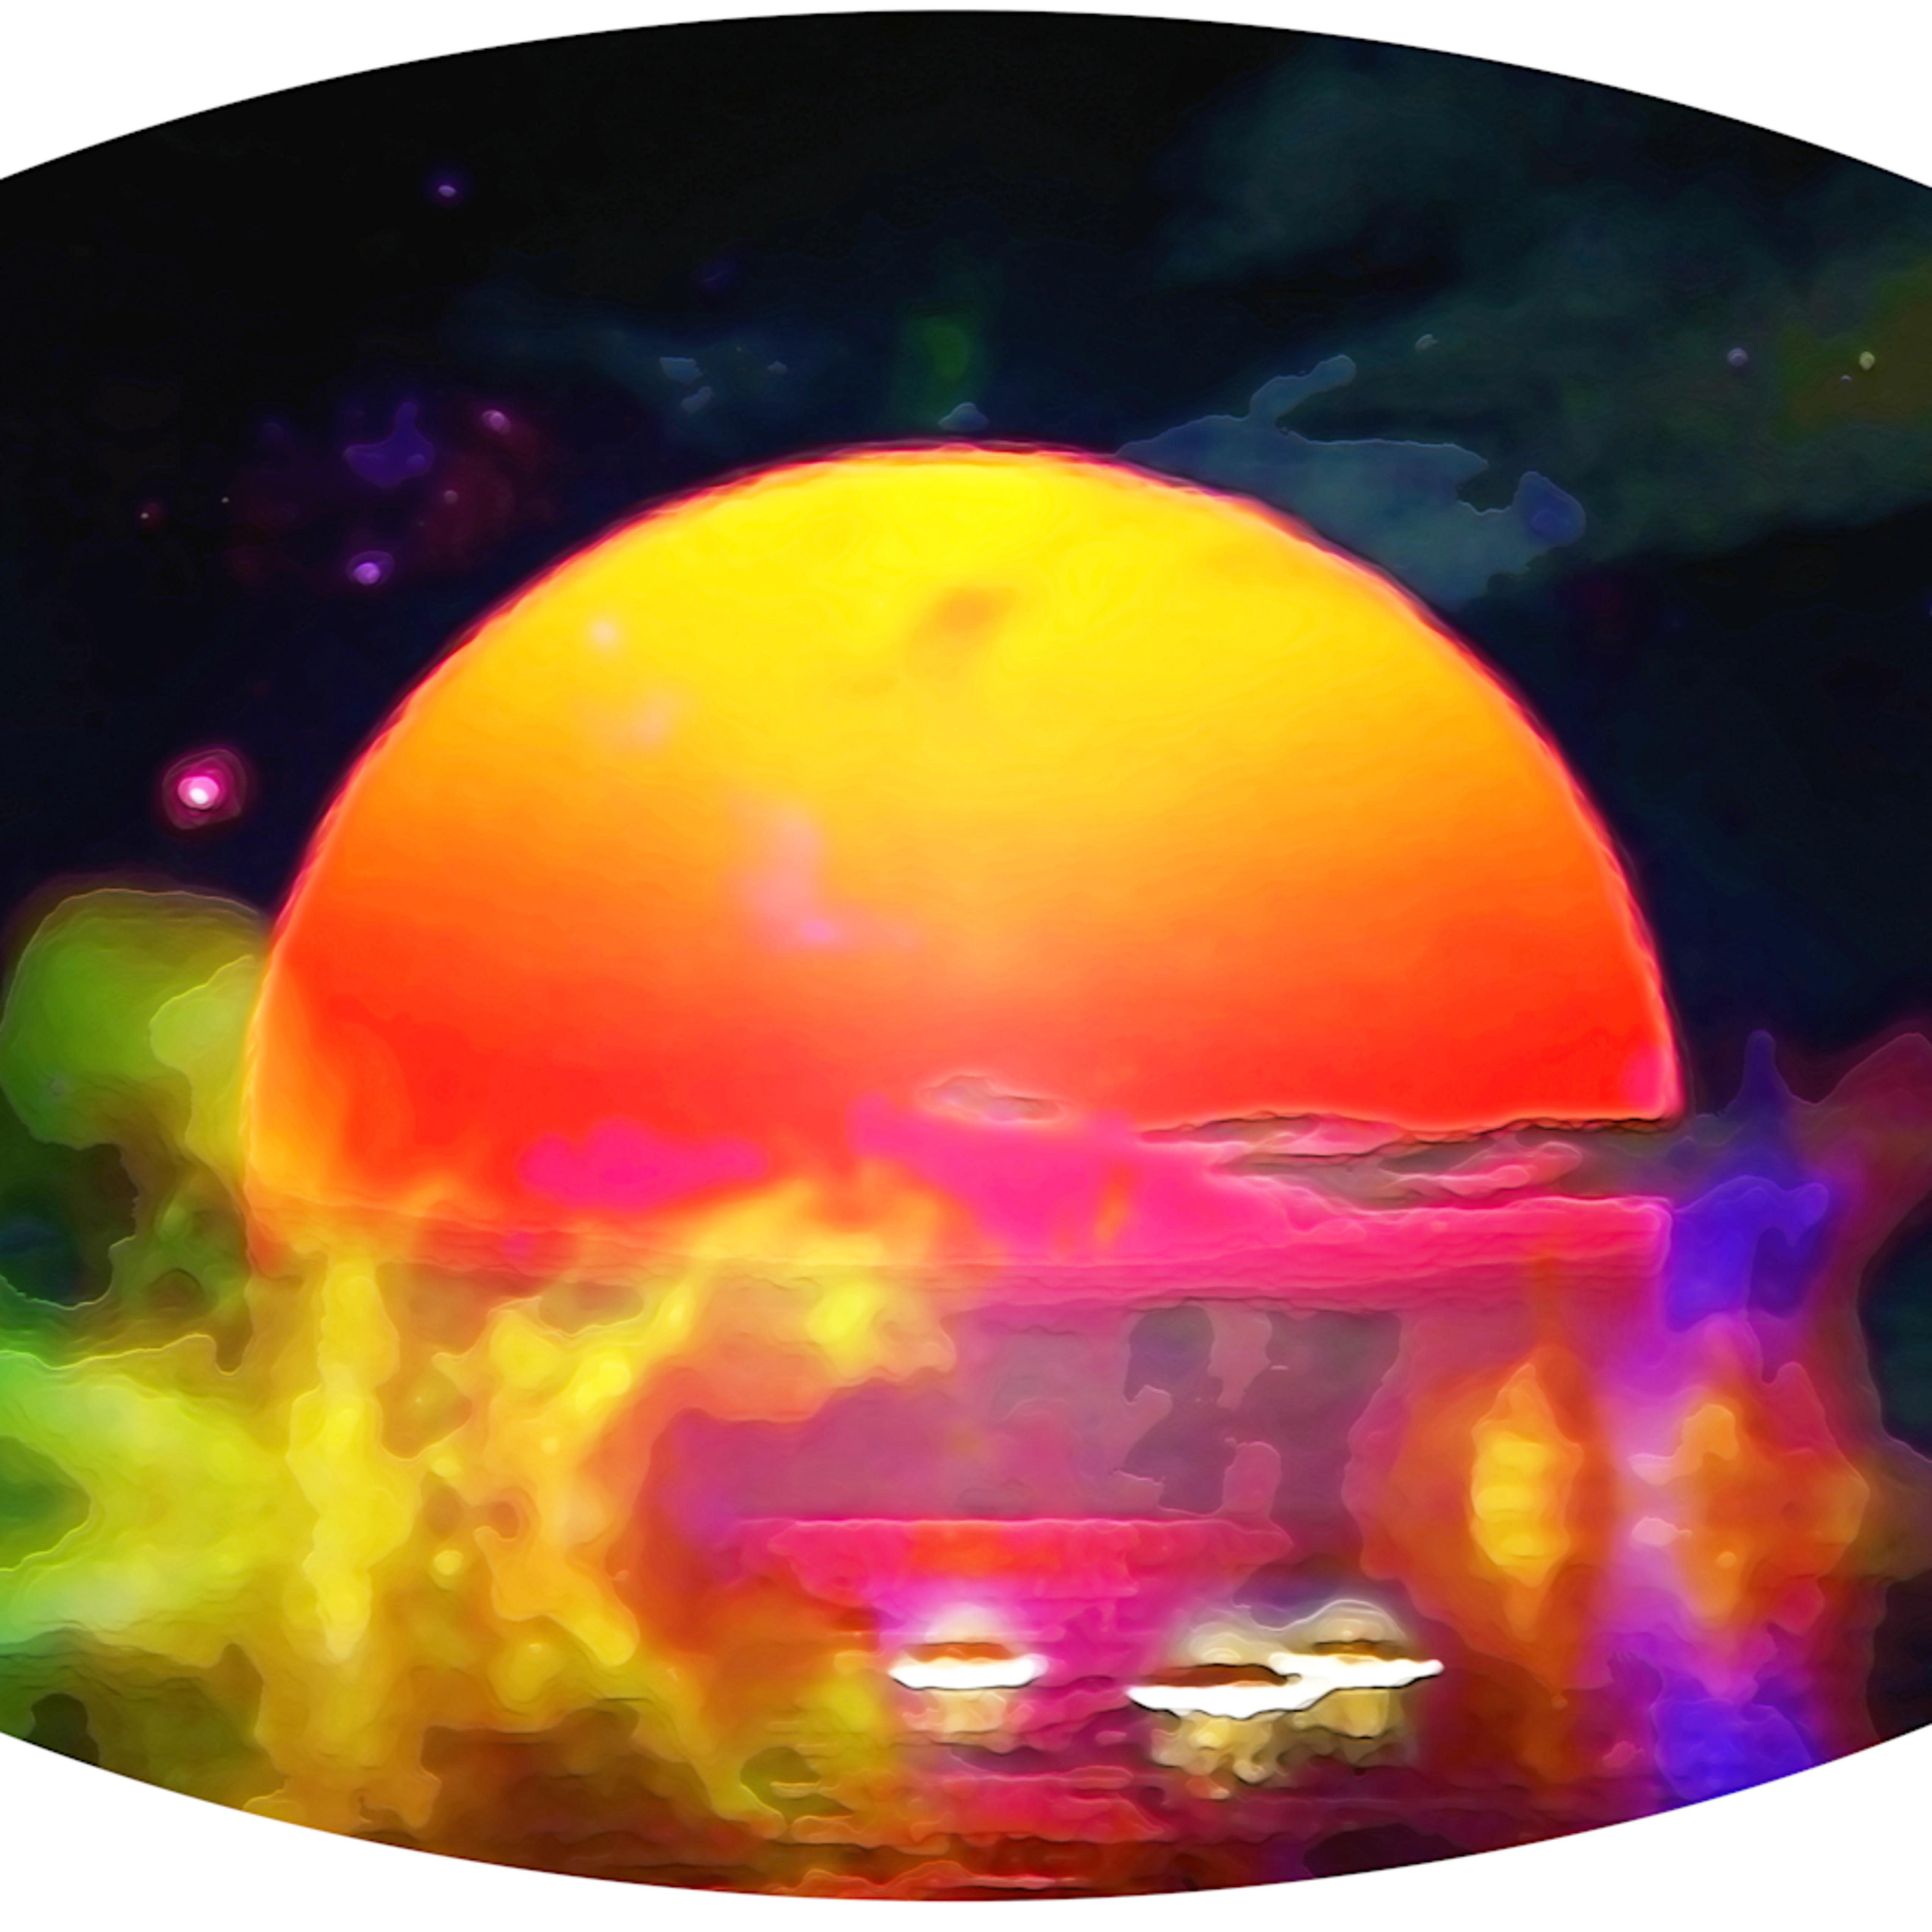 Merch auto 7 orange moon rise qngqnc